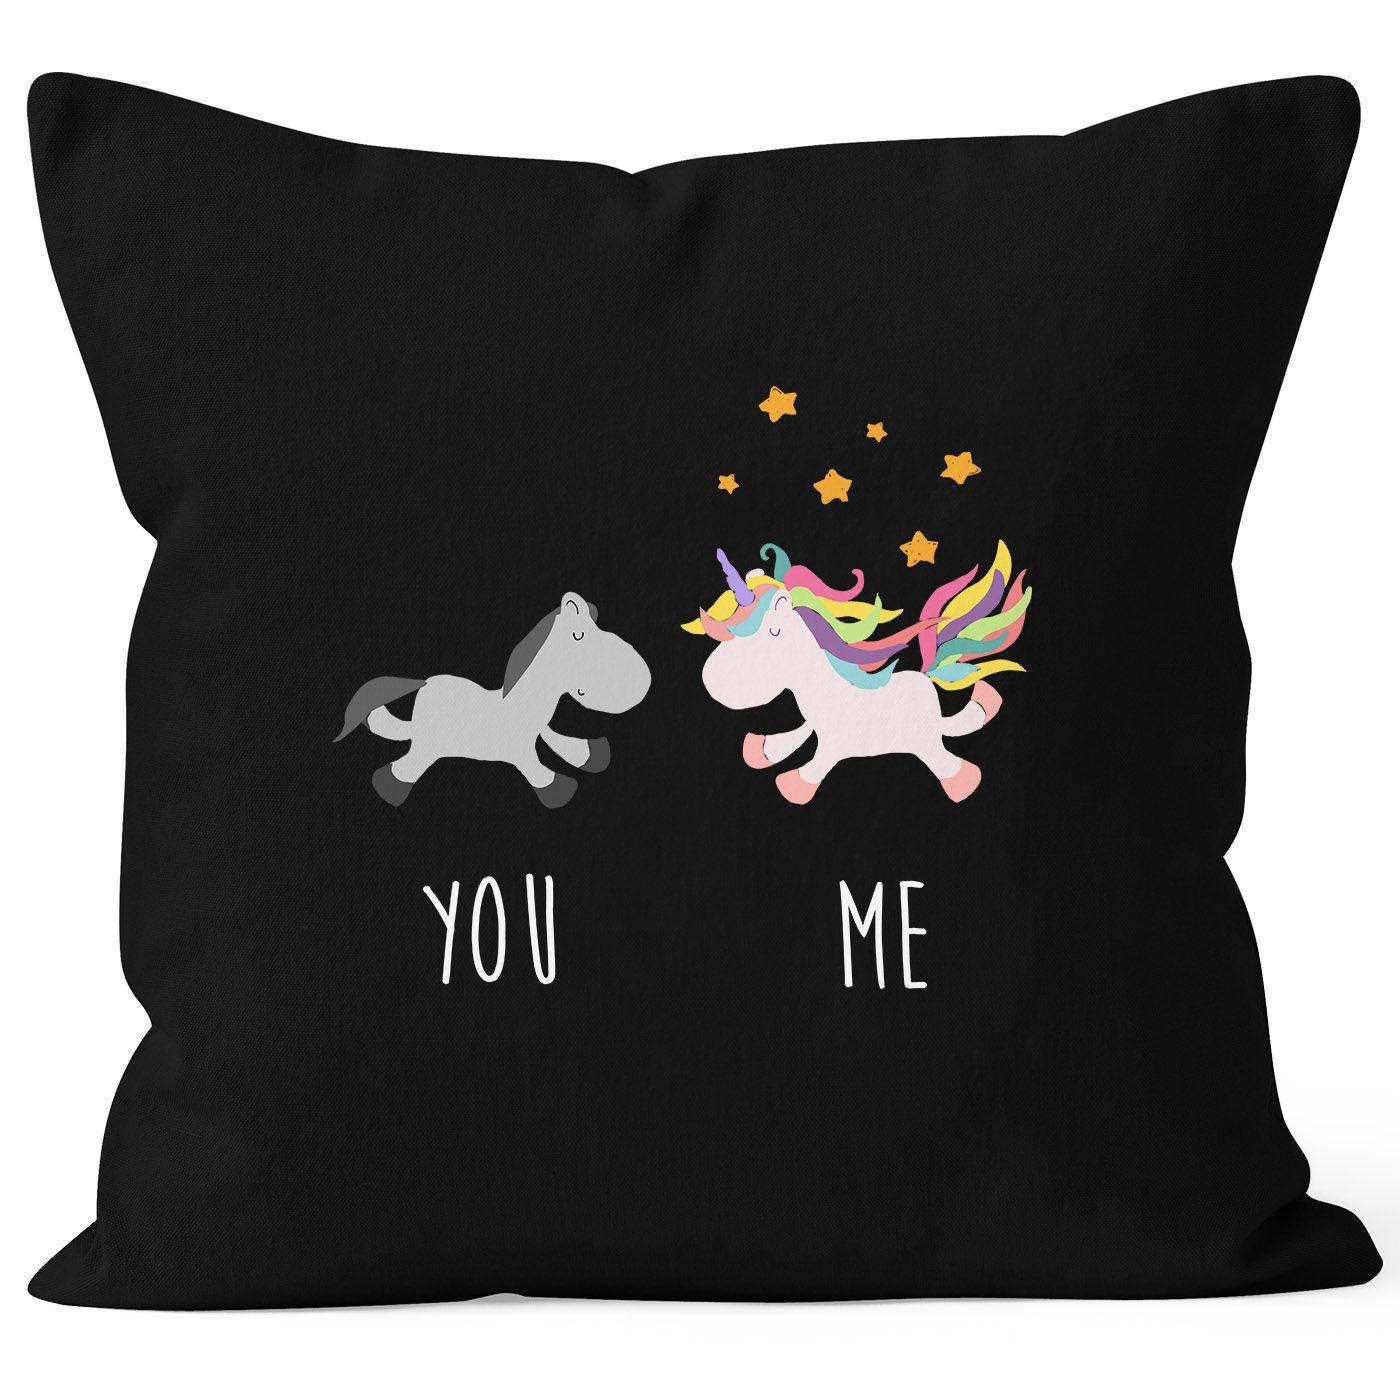 kissenbezug you and me einhorn unicorn deko kissen 40x40. Black Bedroom Furniture Sets. Home Design Ideas